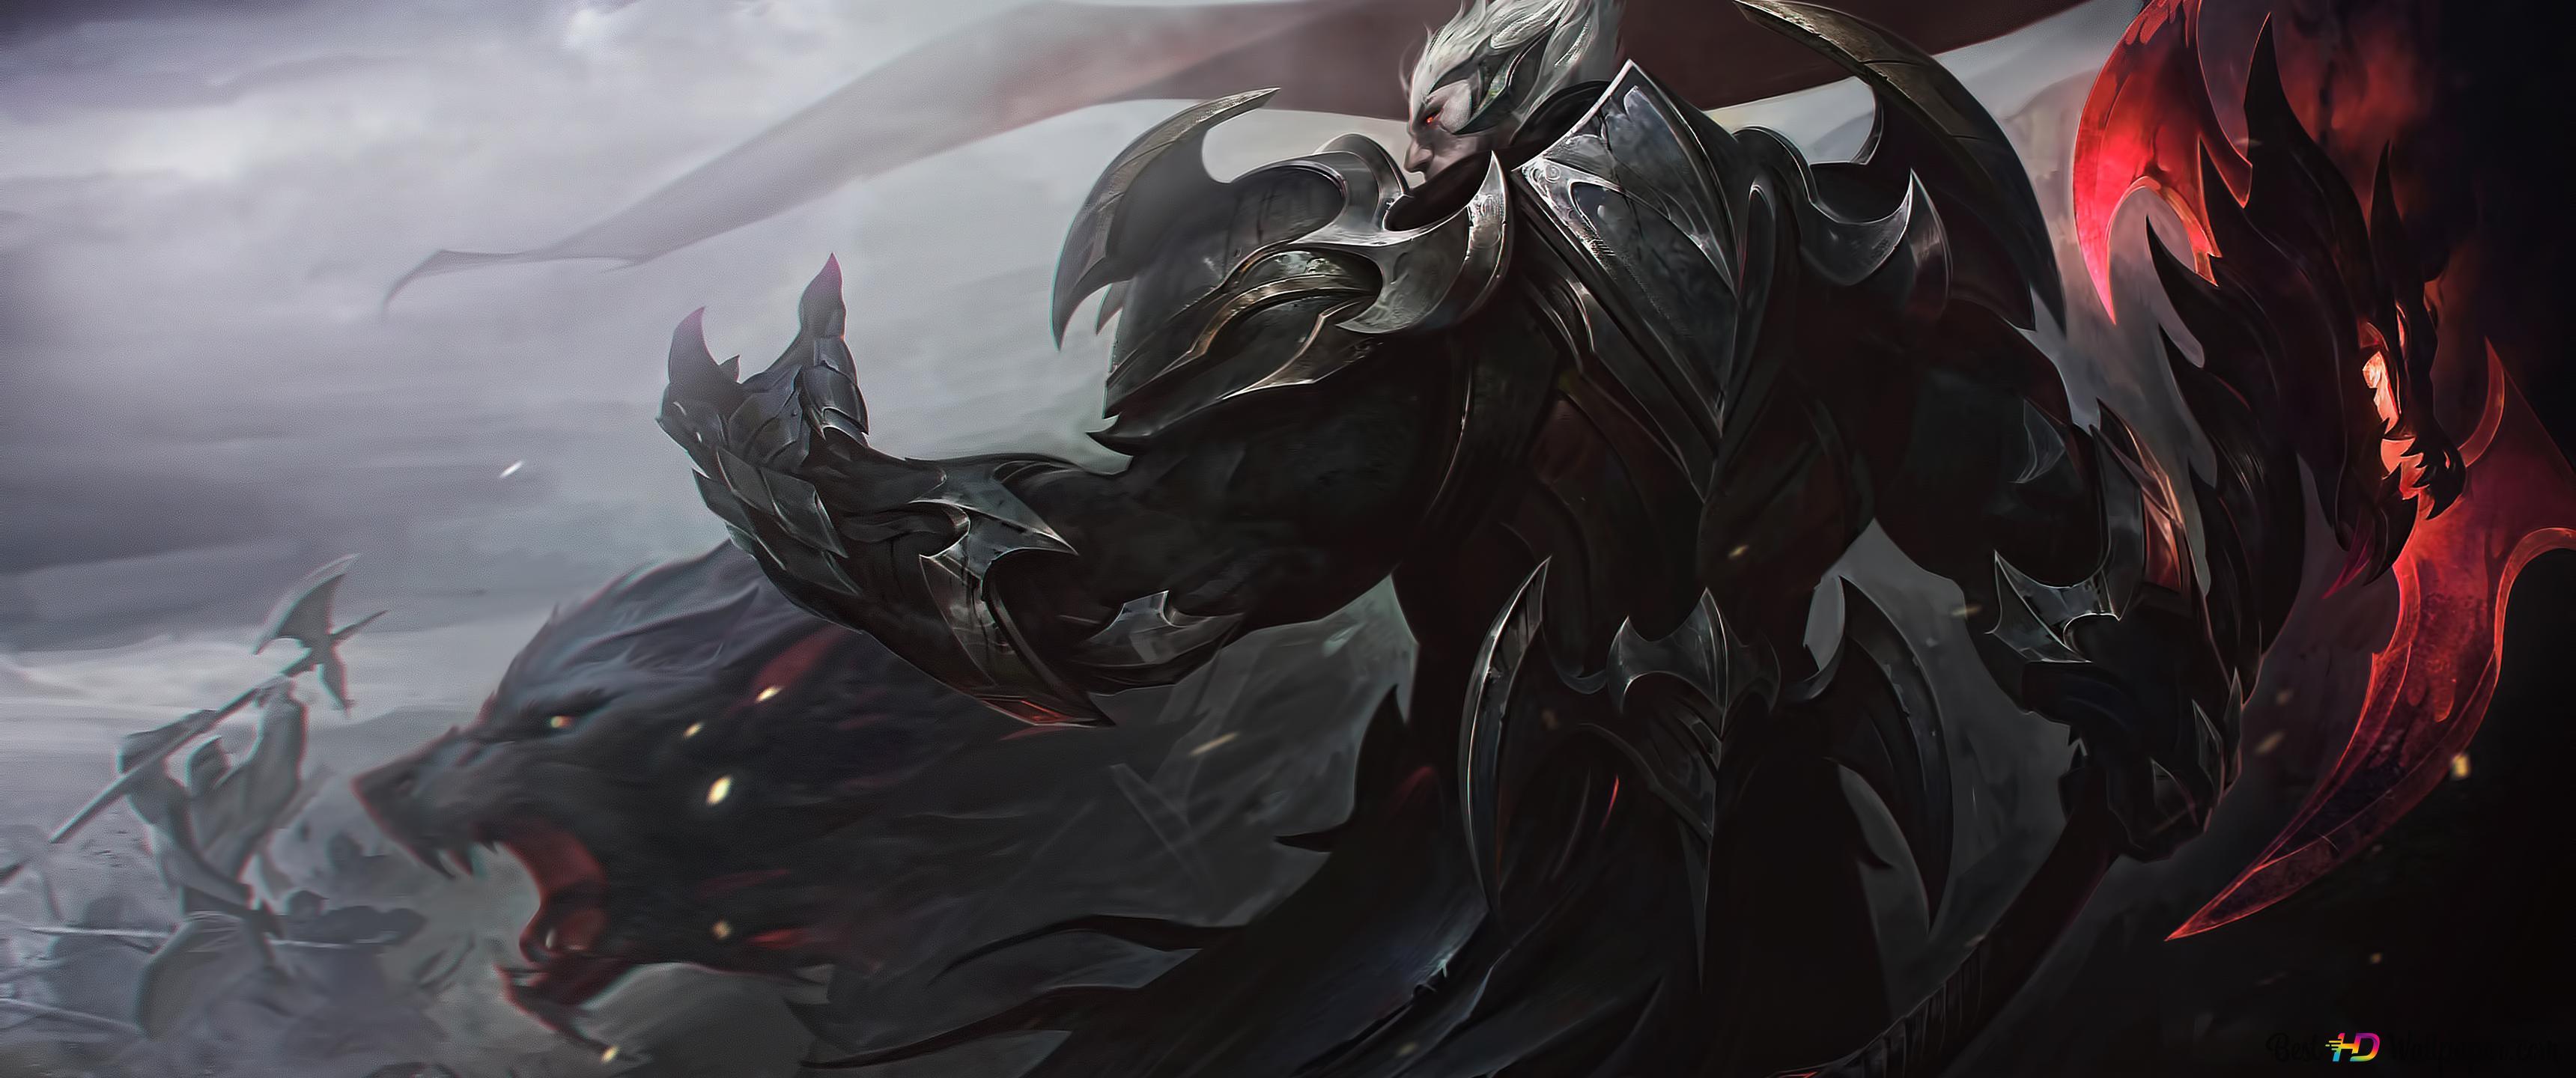 League Of Legends Lol Darius Hd Wallpaper Download